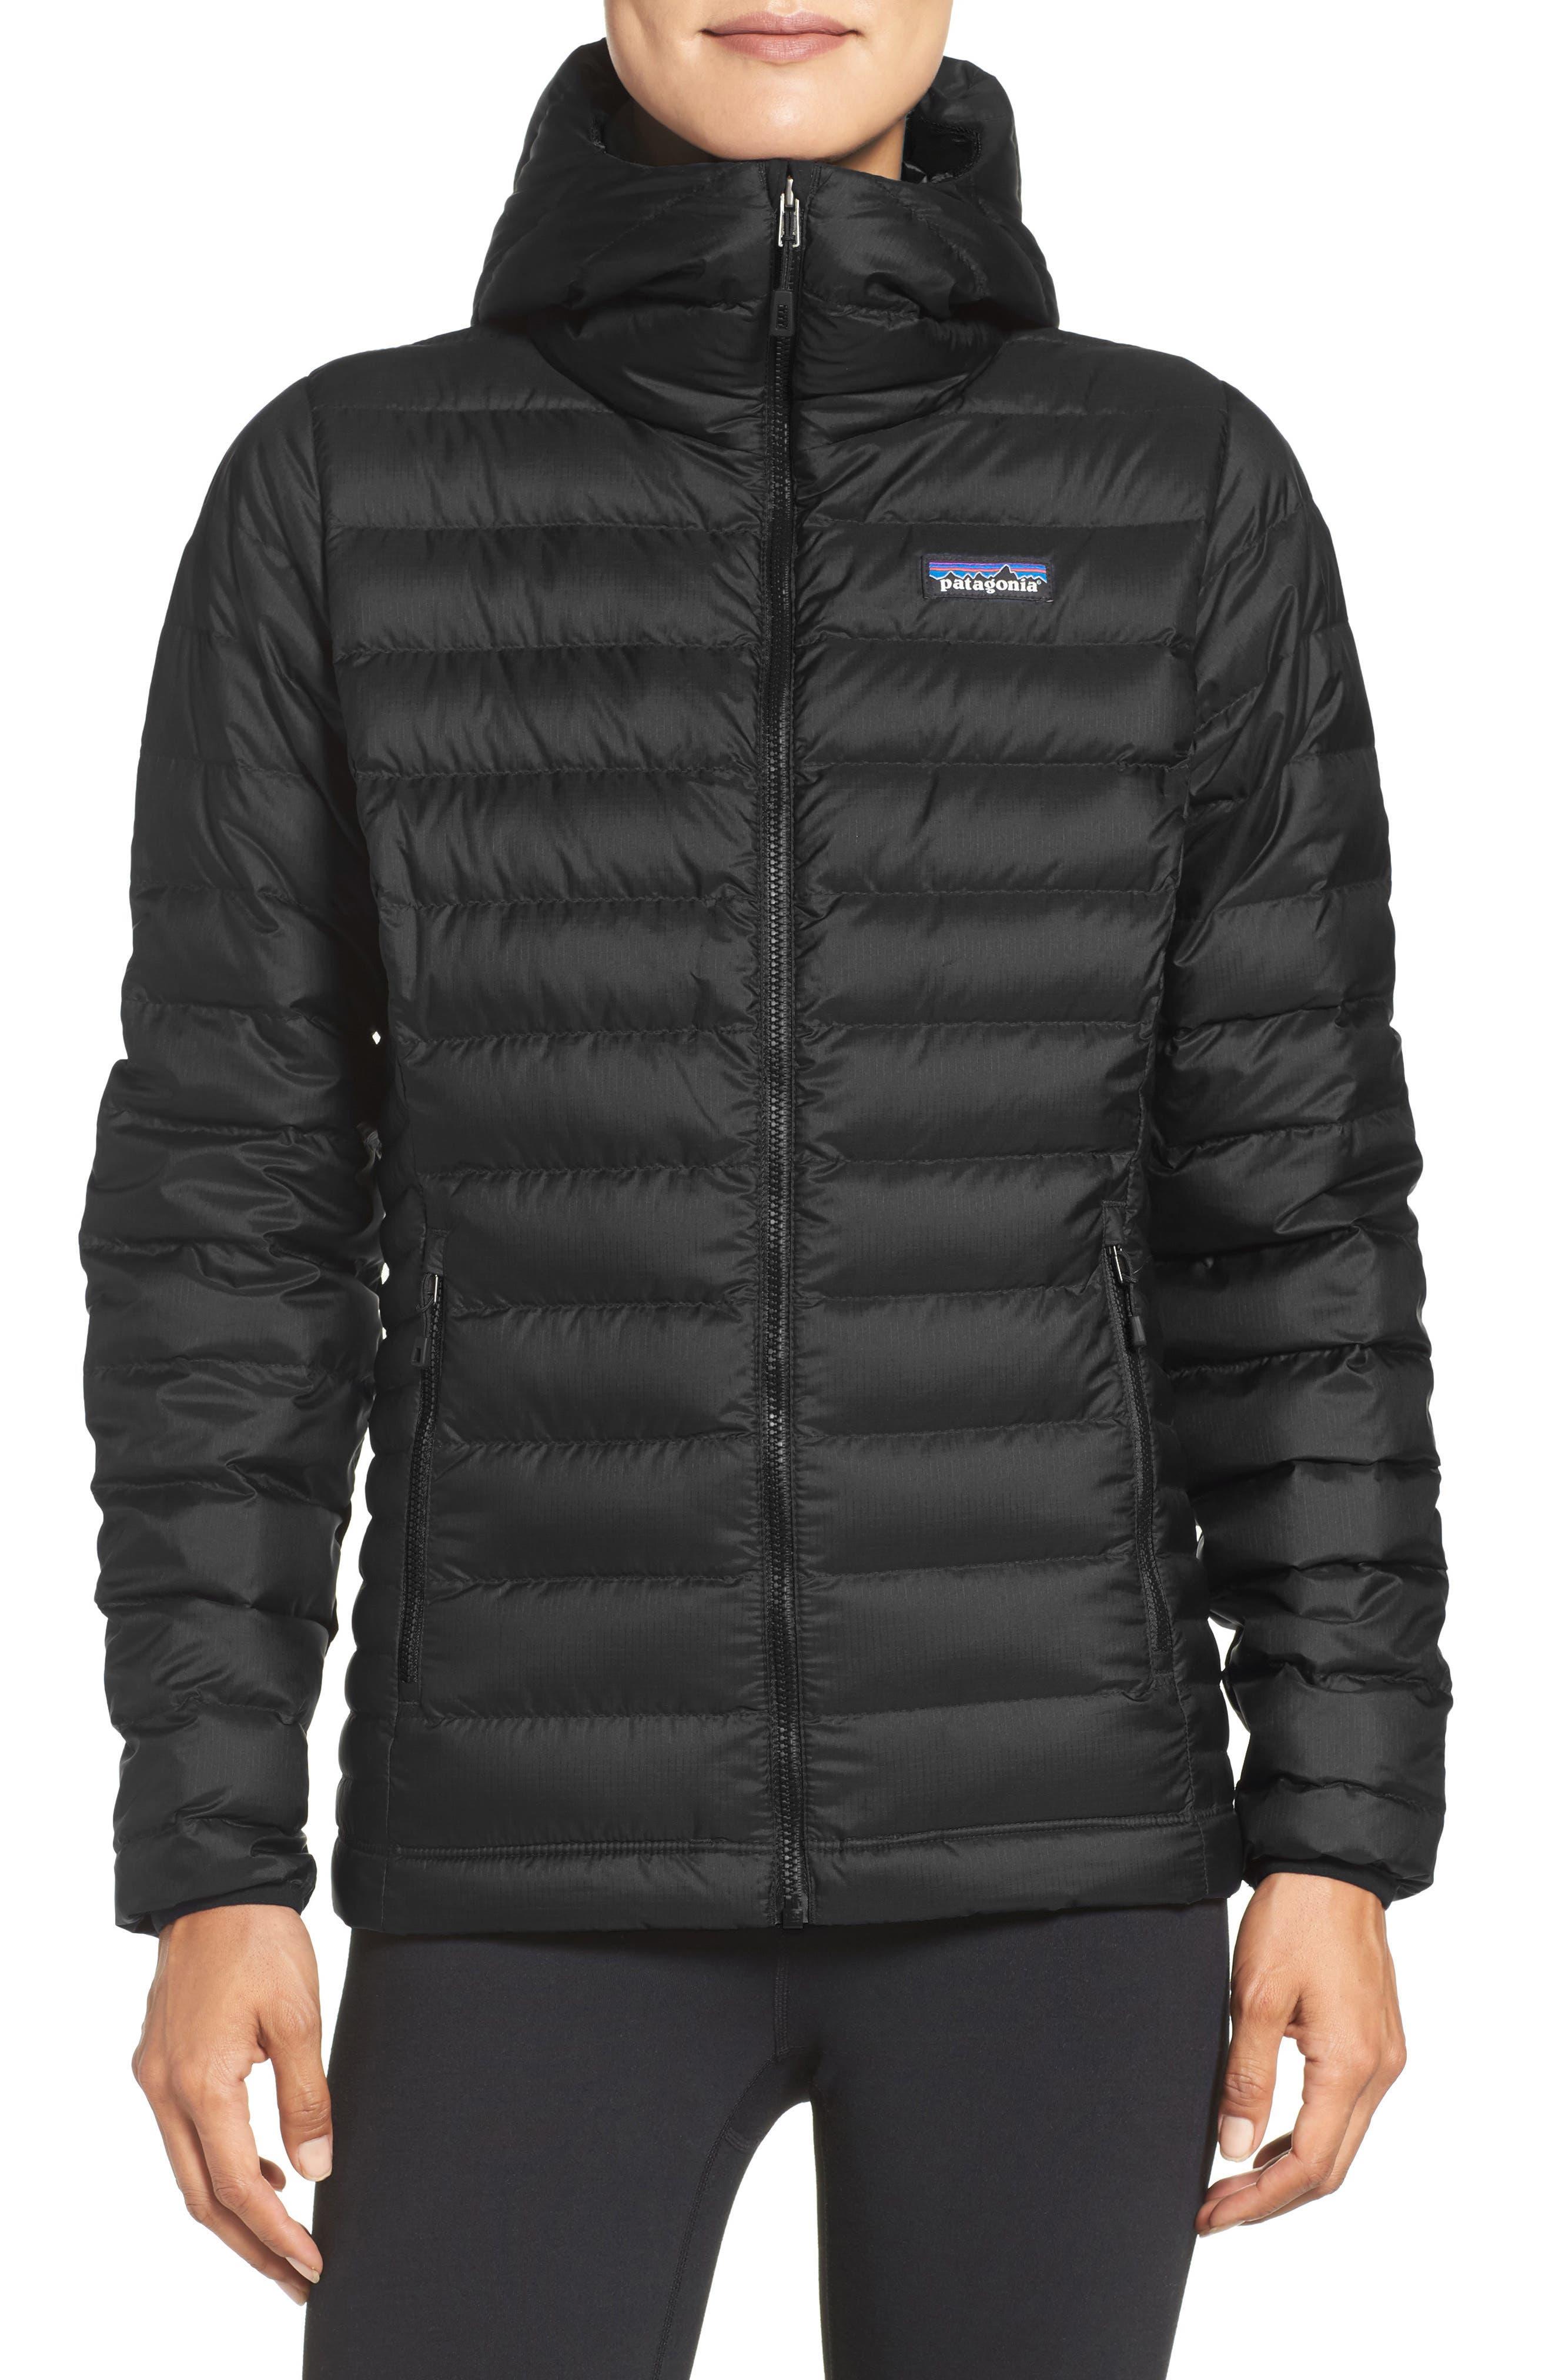 32fac65391e5 patagonia jacket